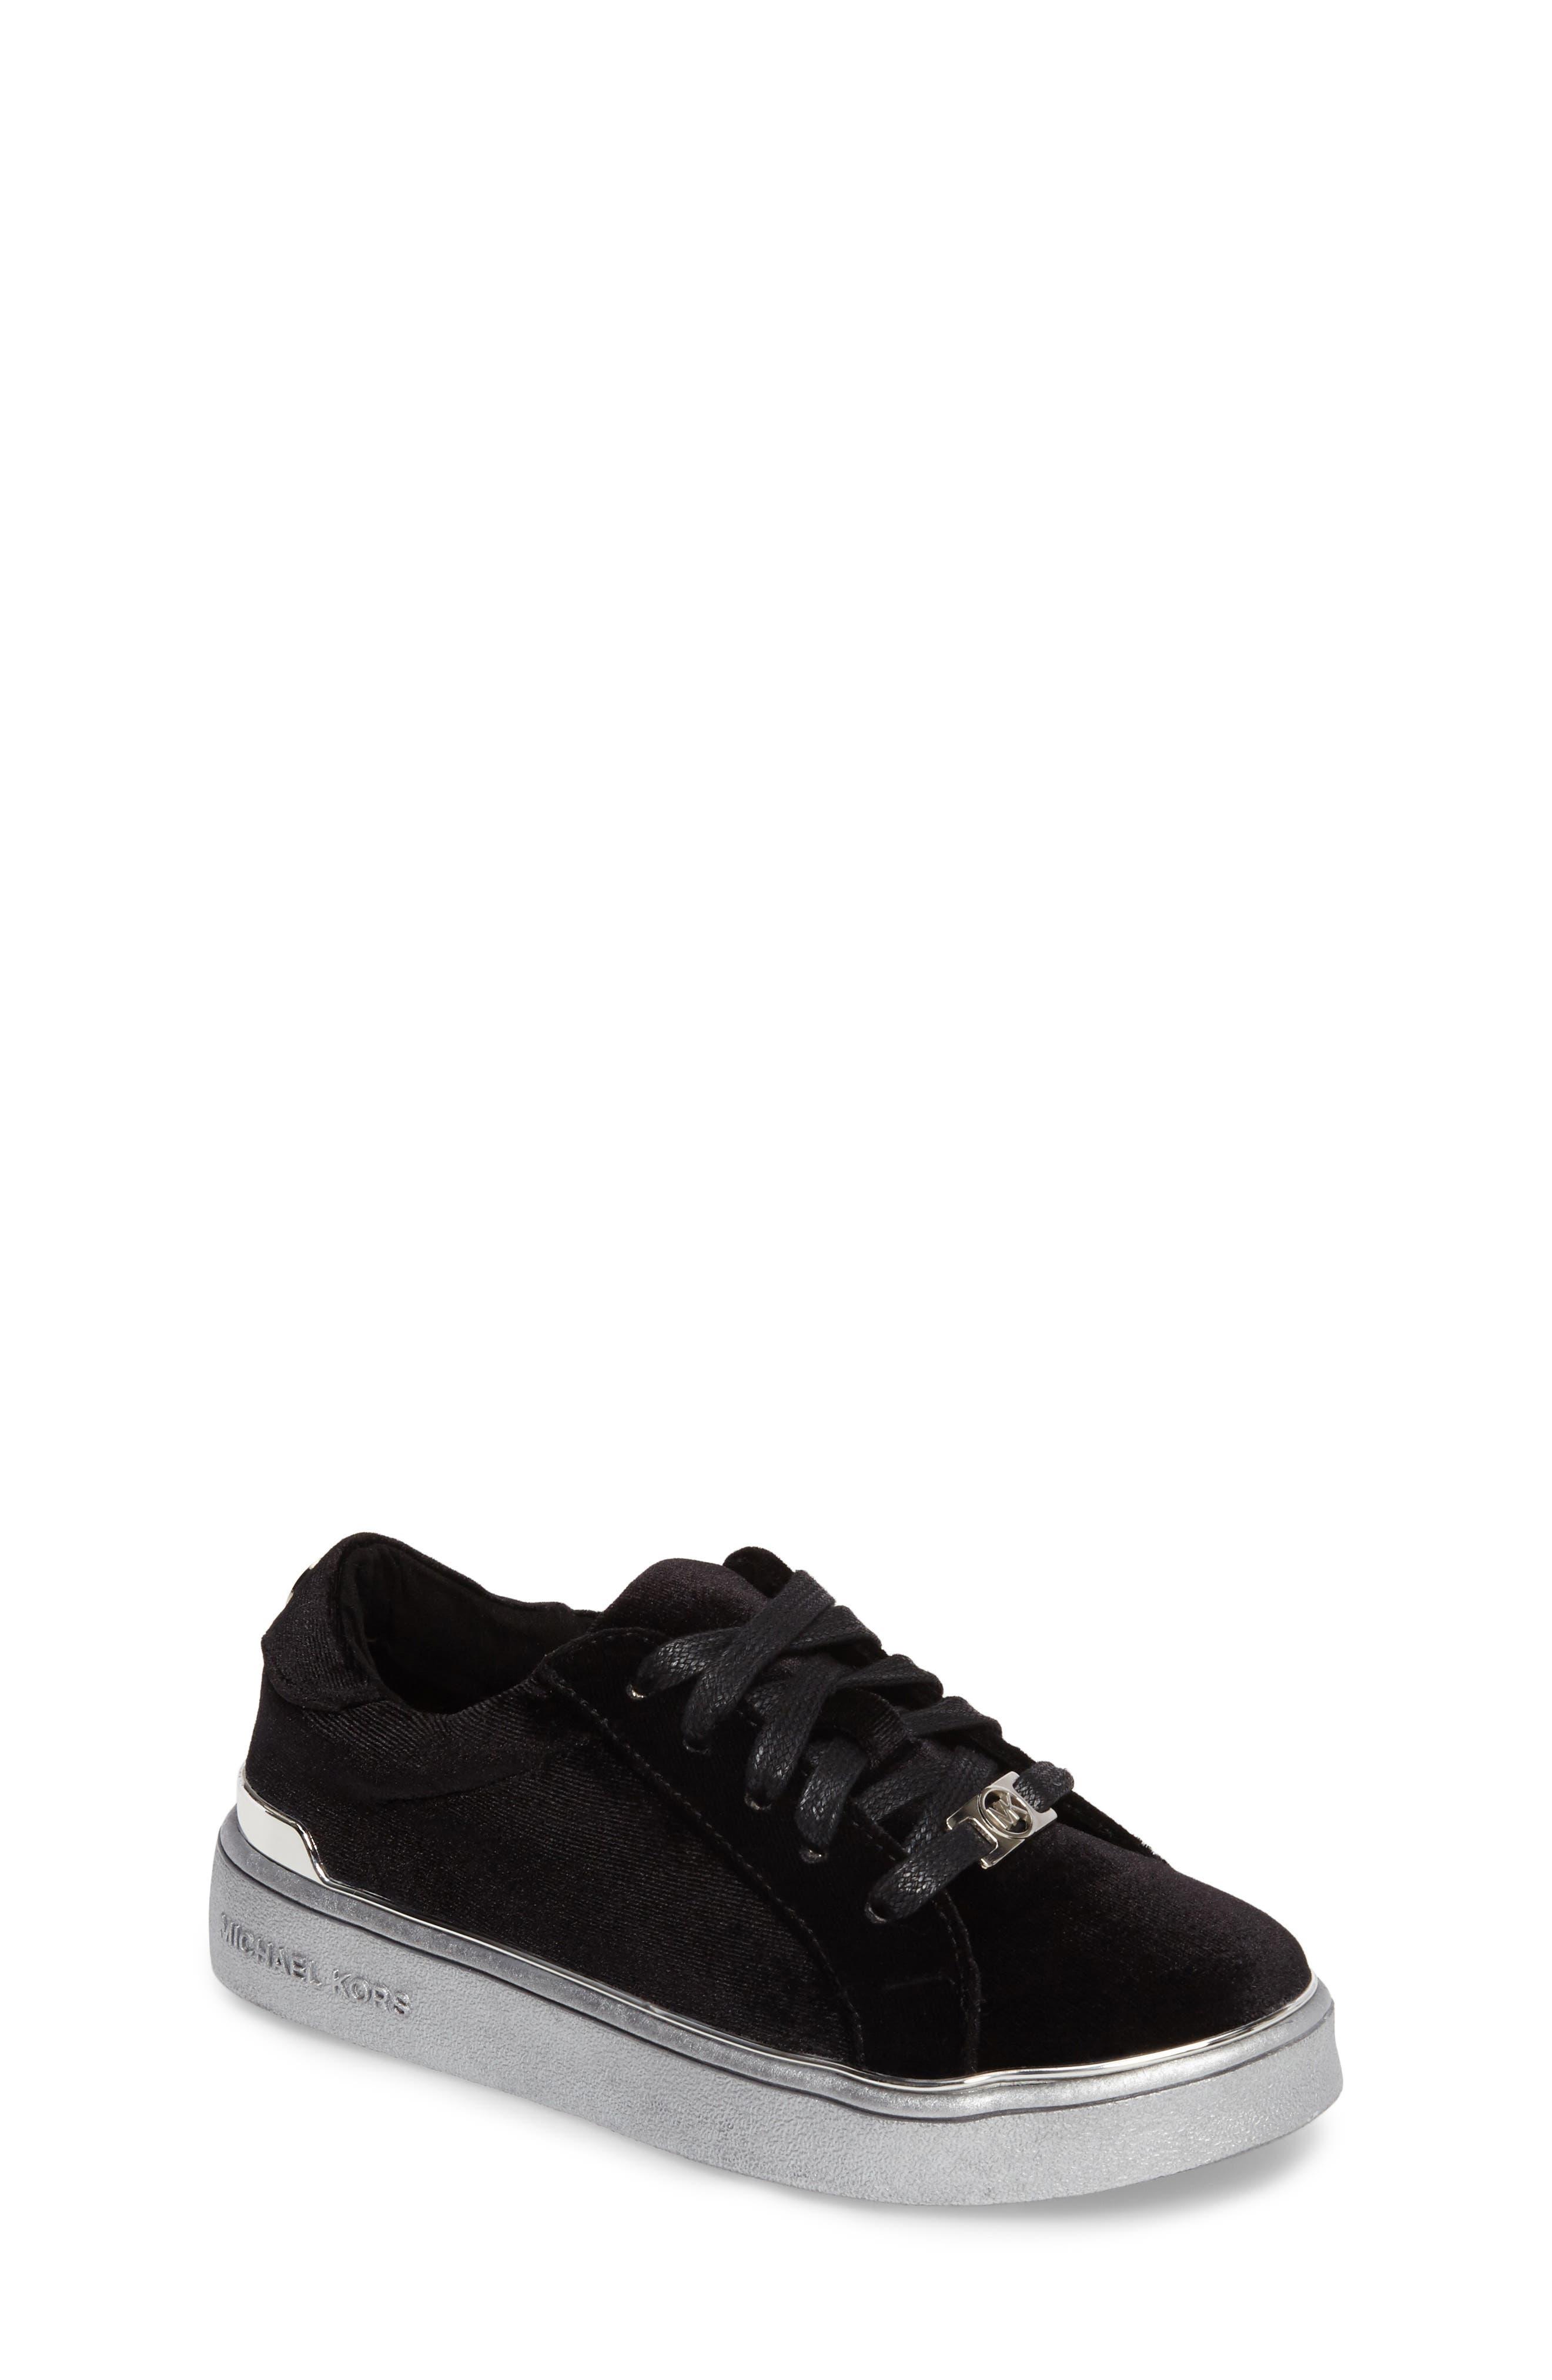 MICHAEL Michael Kors Ivy Cola Sneaker (Walker, Toddler, Little Kid & Big Kid)